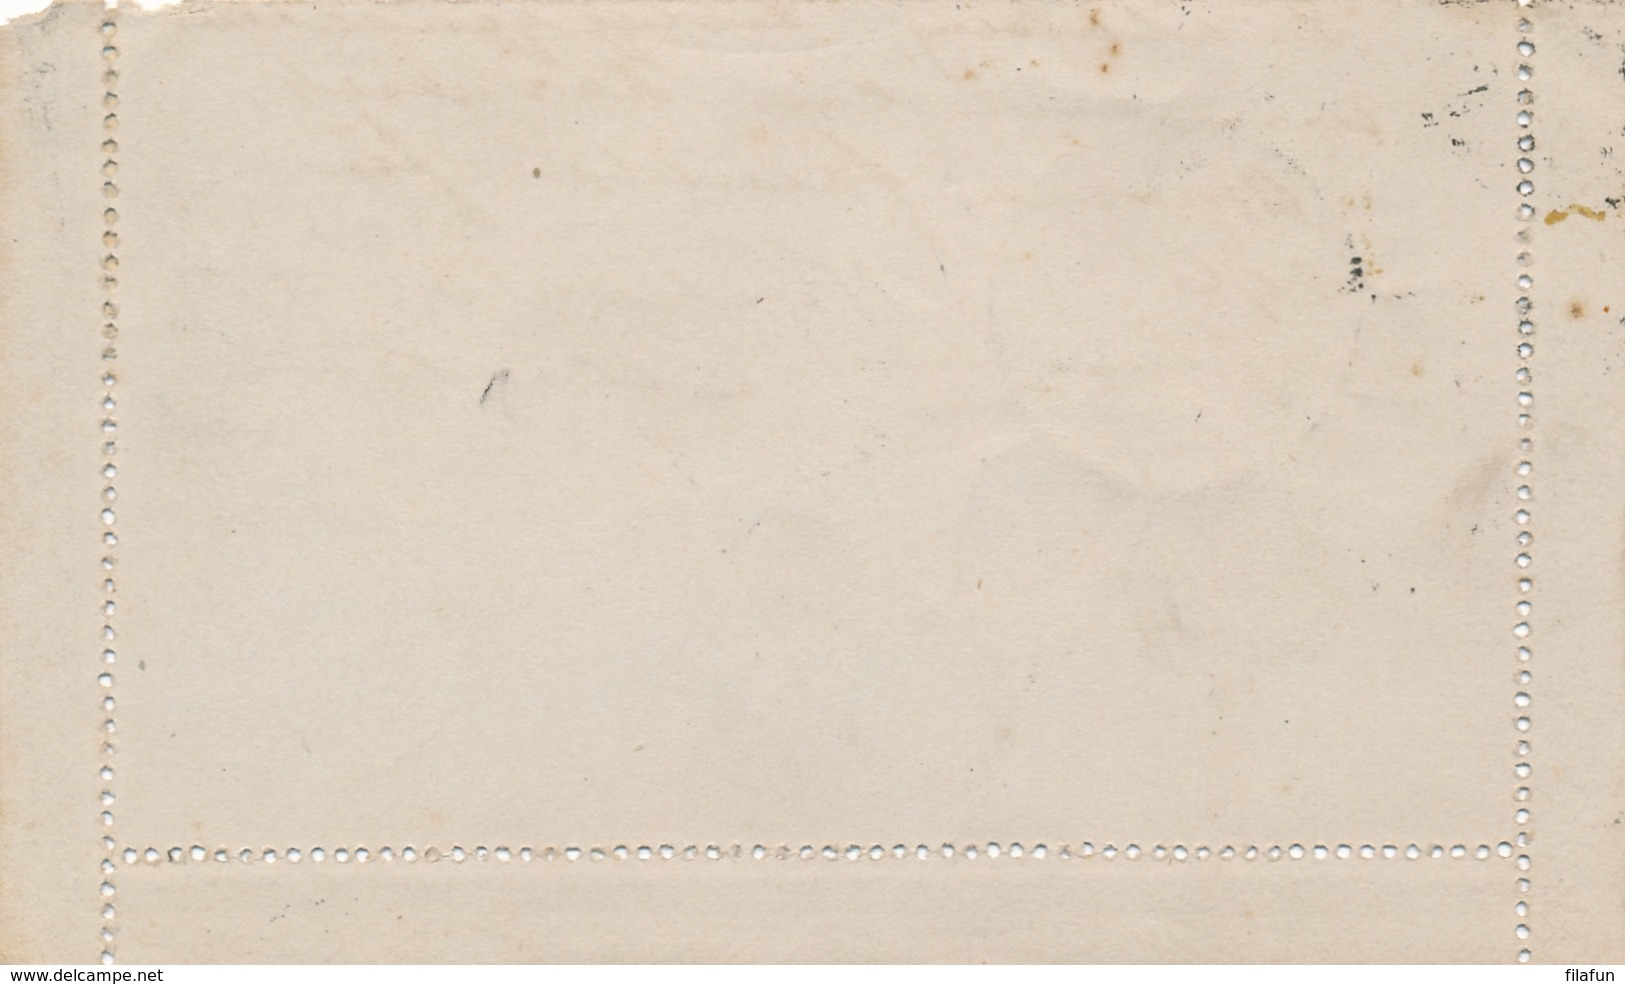 Nederland - 1896 -  5 Cent Hangend Haar, Postblad G6 + 7,5 Cent HH & 2 Cent Van KR Amsterdam/14 Naar Budapest / Hungary - Entiers Postaux